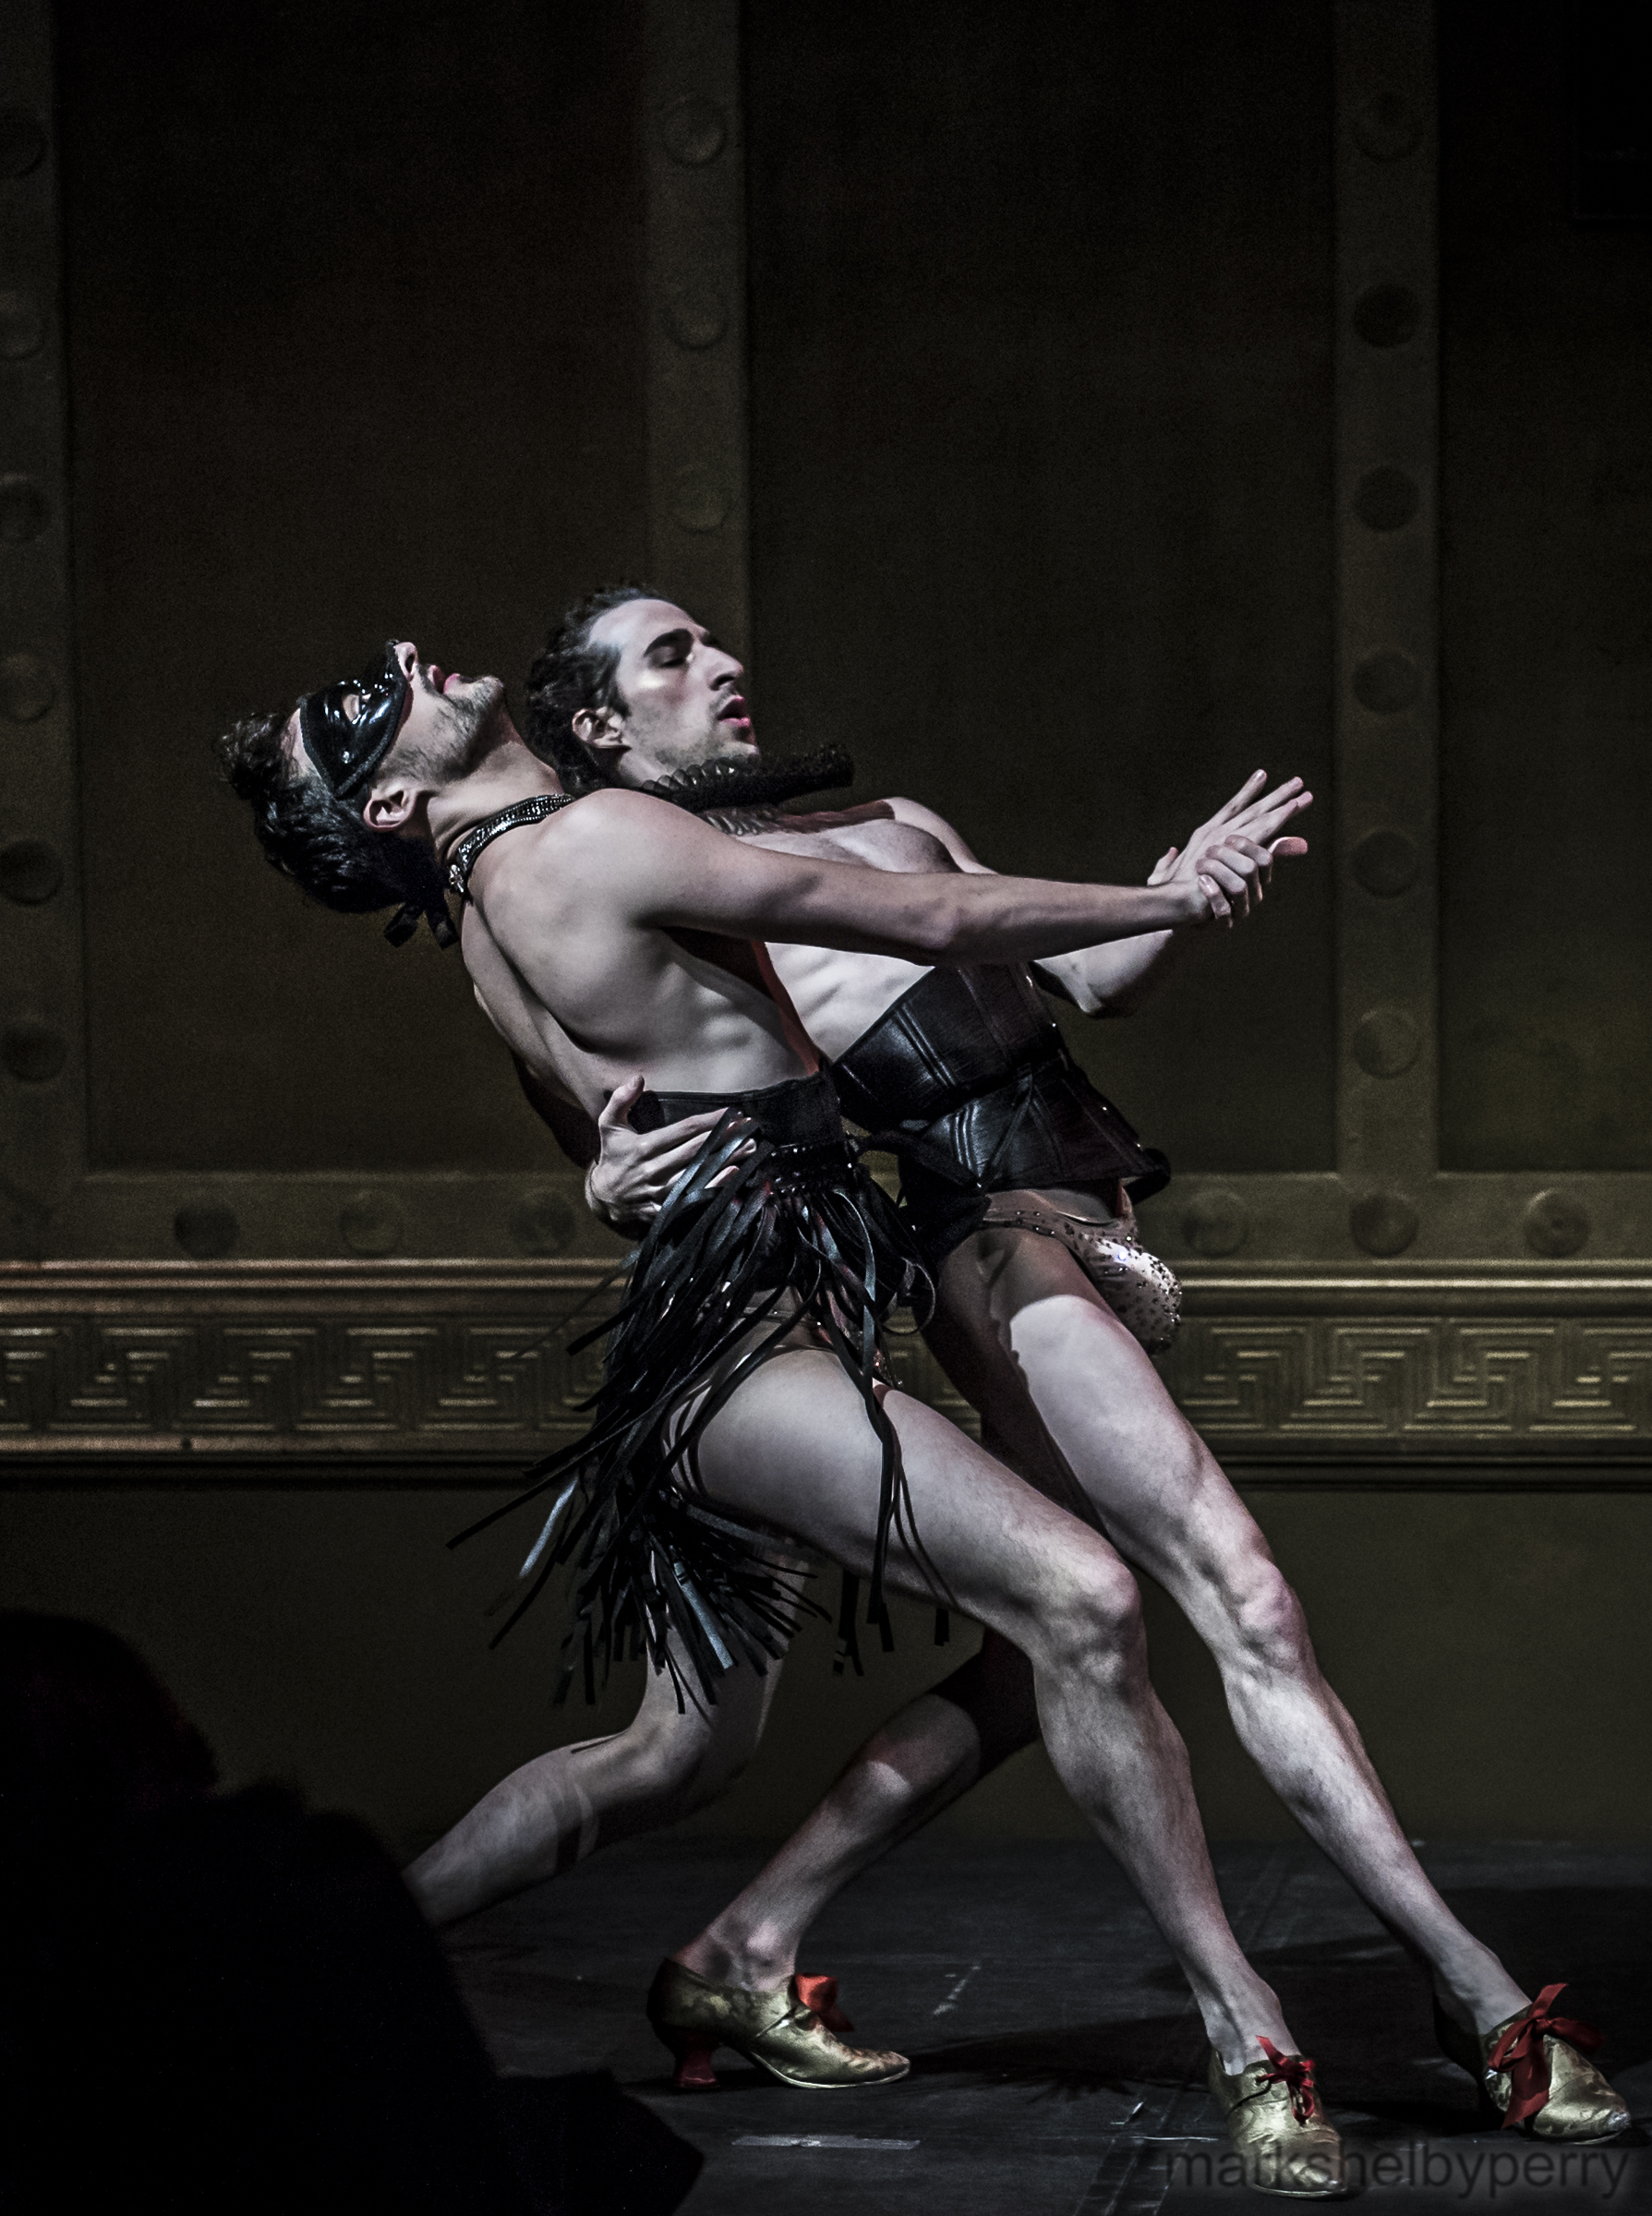 Fetish Themed Tango Dancers